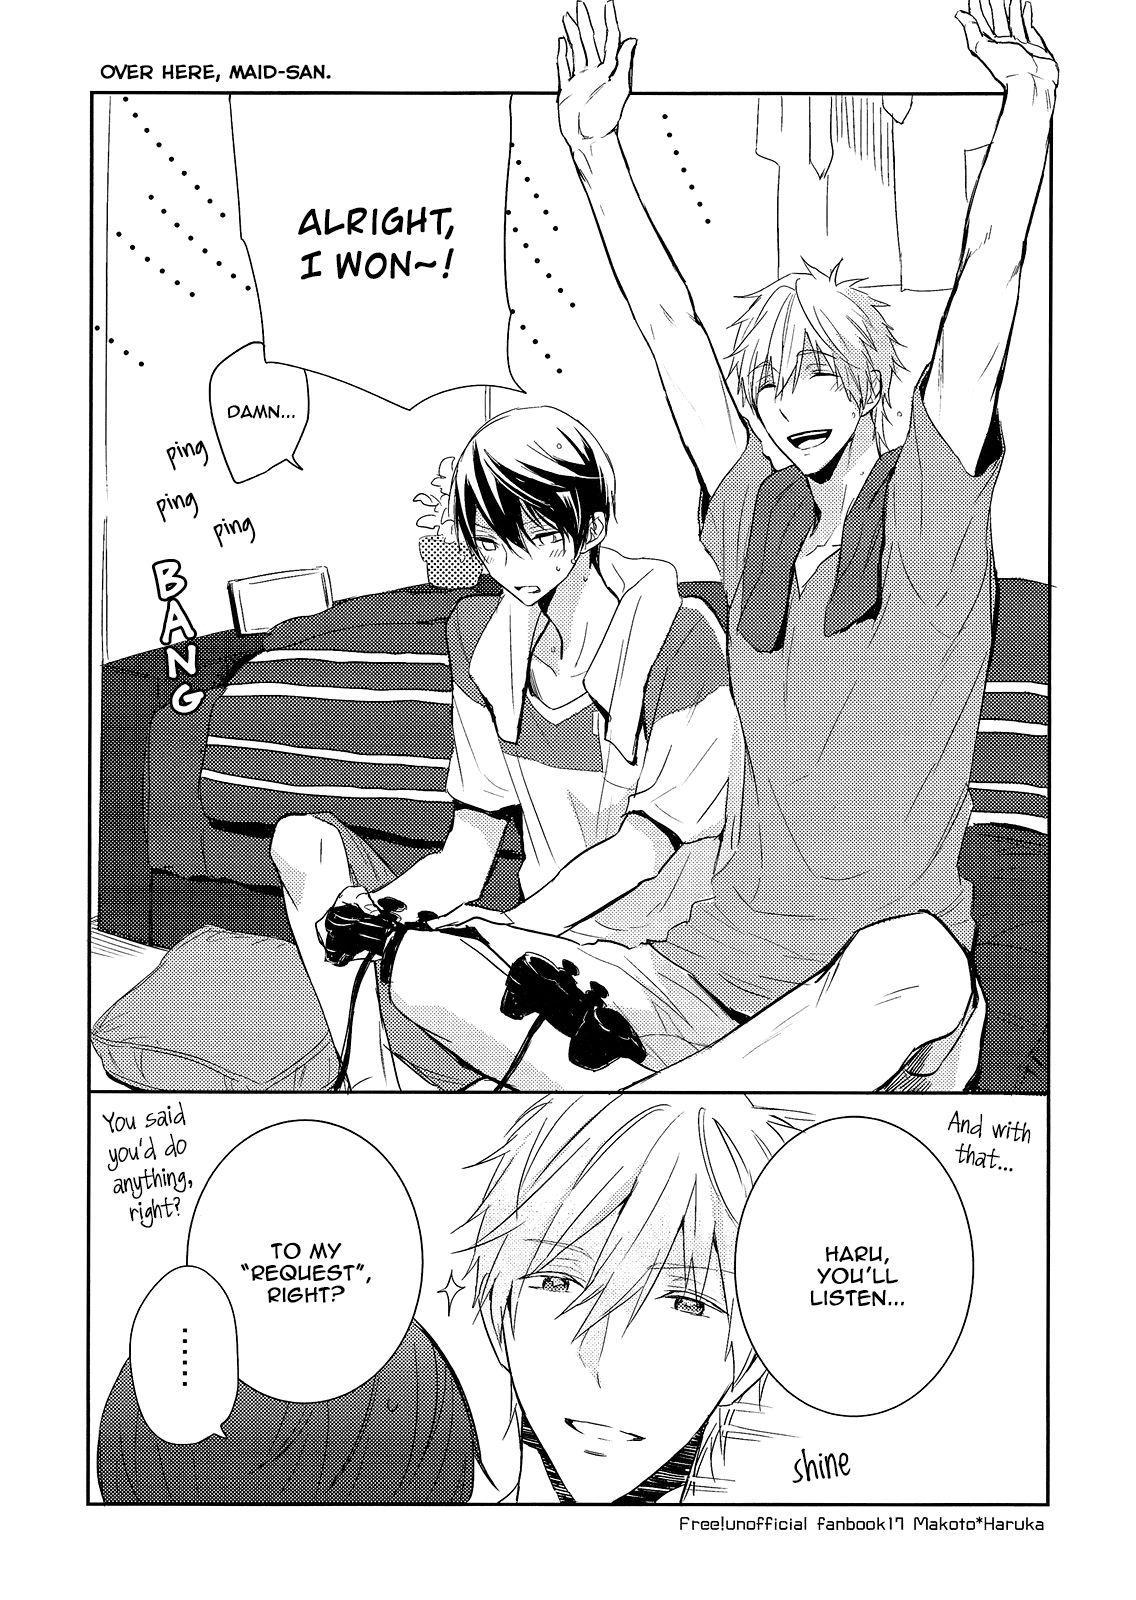 (Renai Endorphin 3) [Sneeeze (Kubu)] Kocchi Muite Maid-san   Over Here, Maid-san (Free!) [English] [mgqr scans] 1